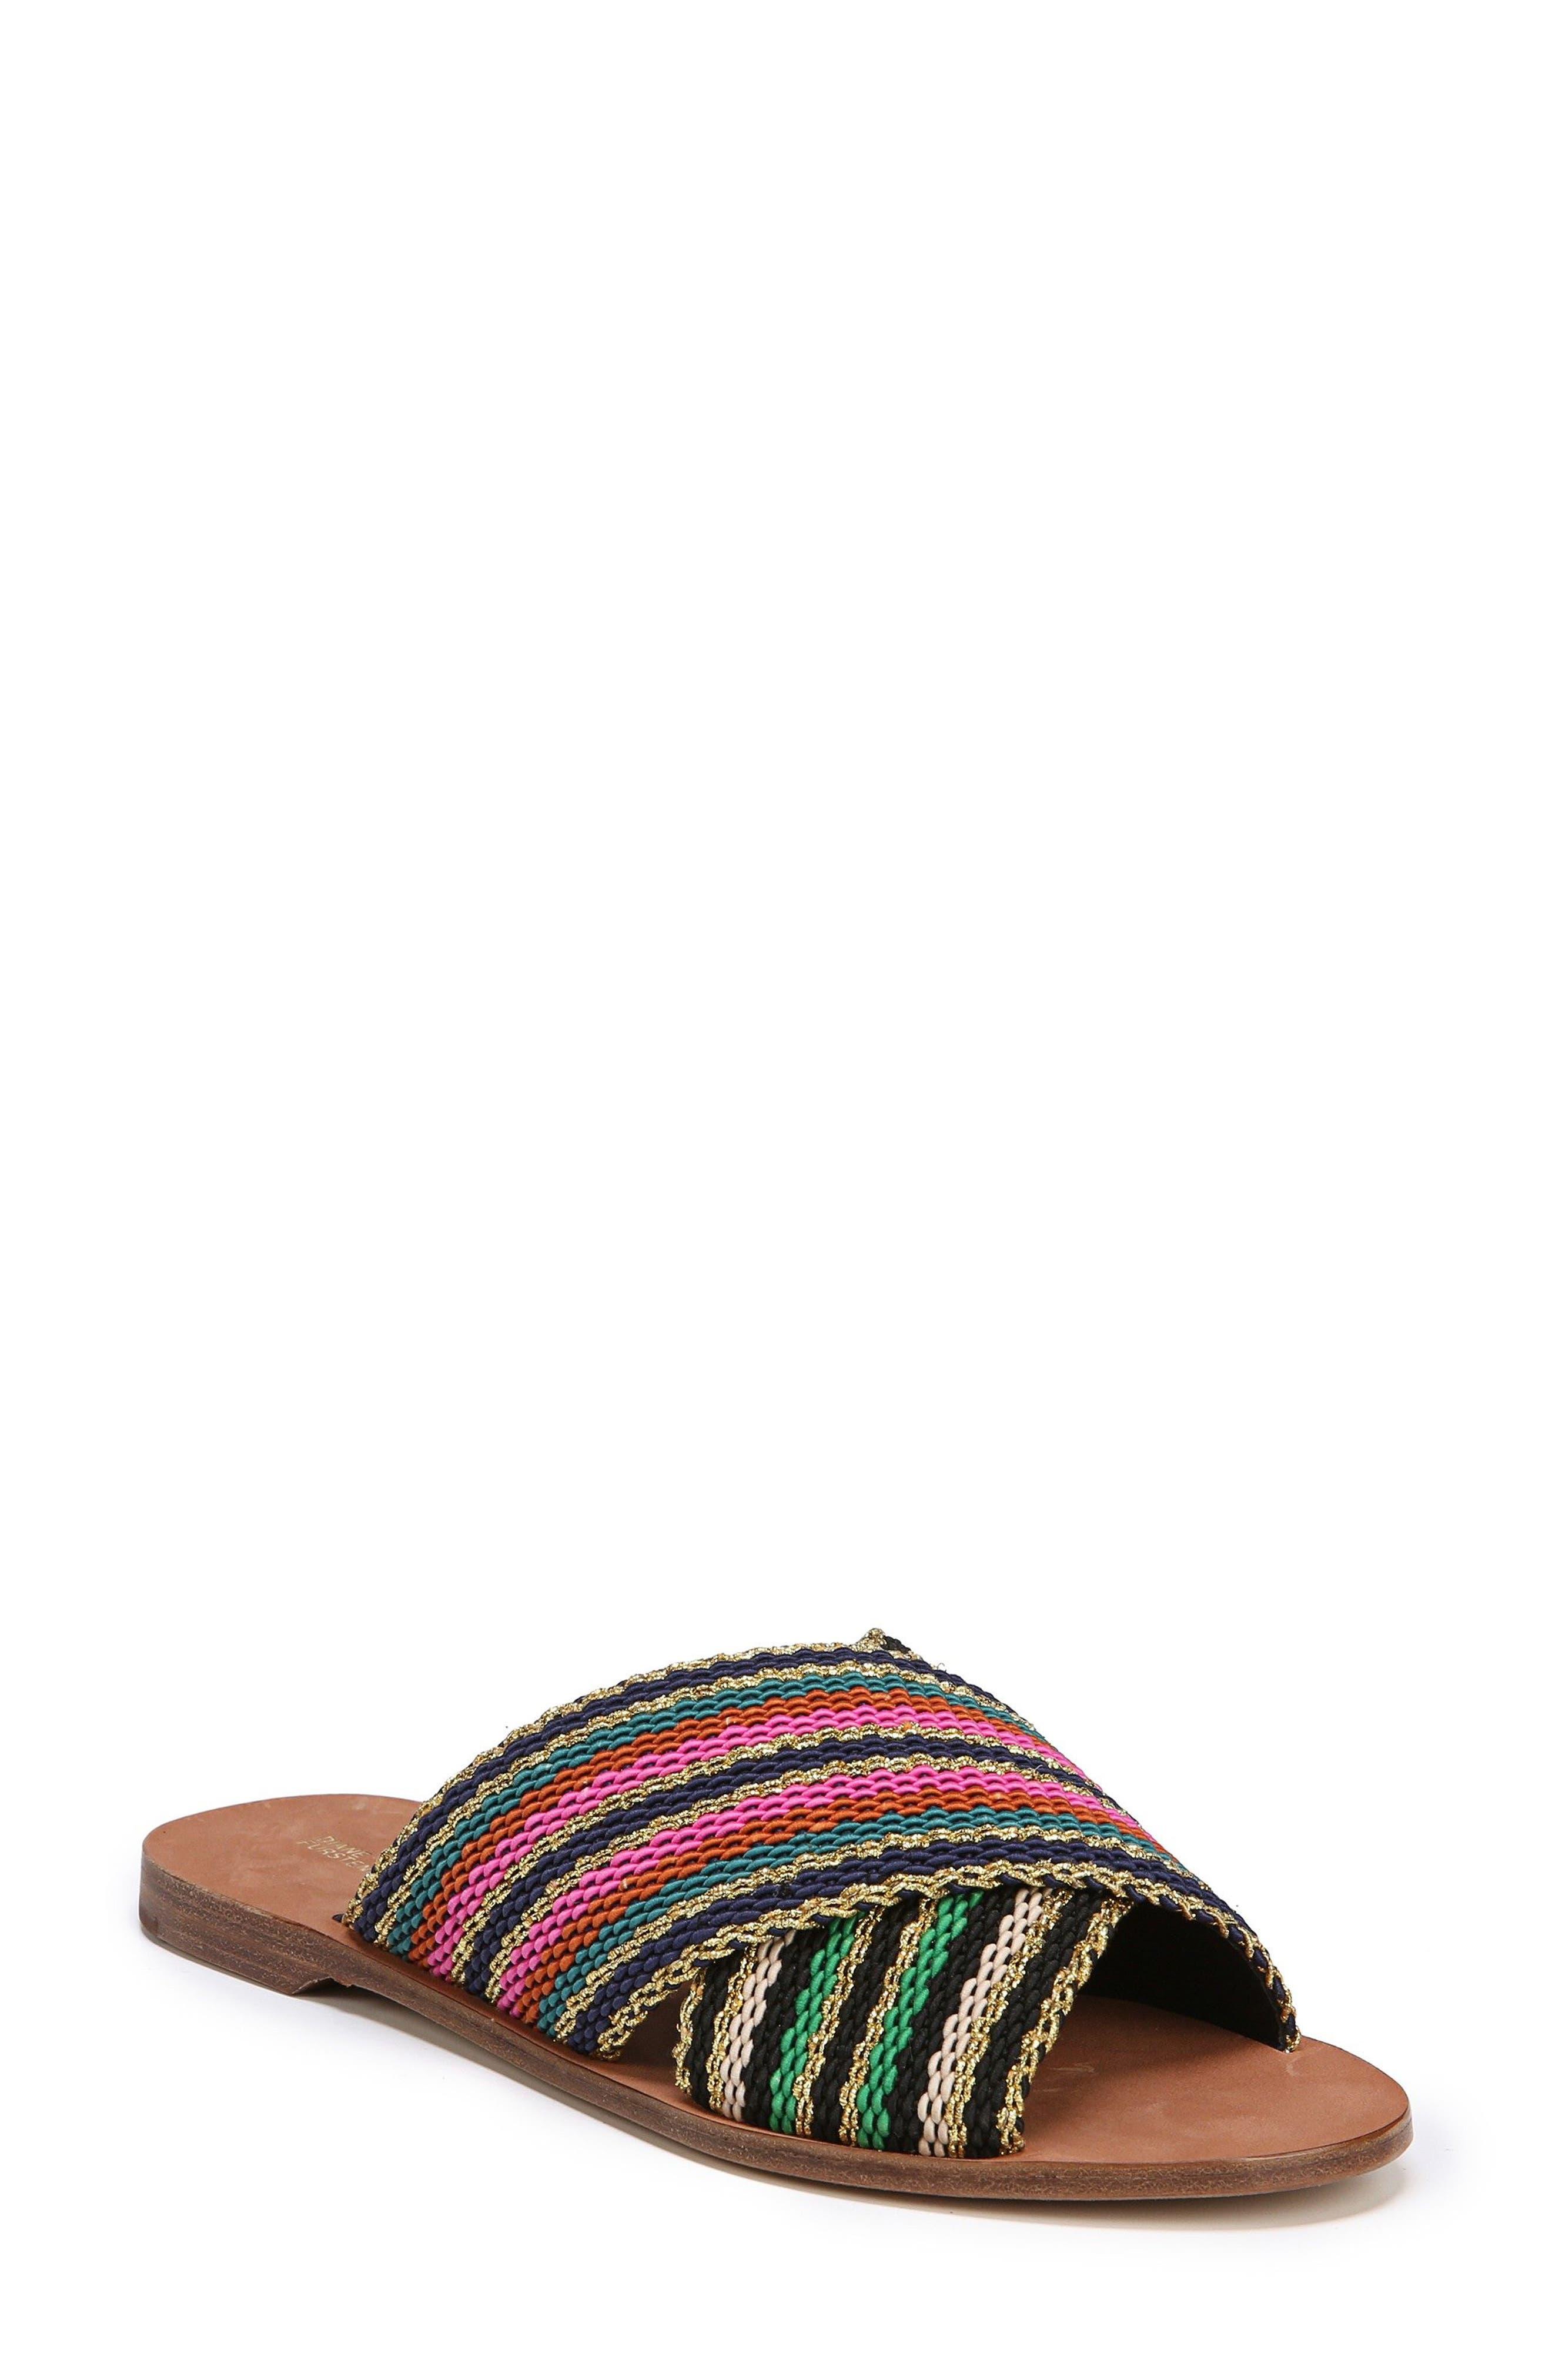 Cindi Woven Slide Sandal,                             Main thumbnail 1, color,                             Black/ Gold